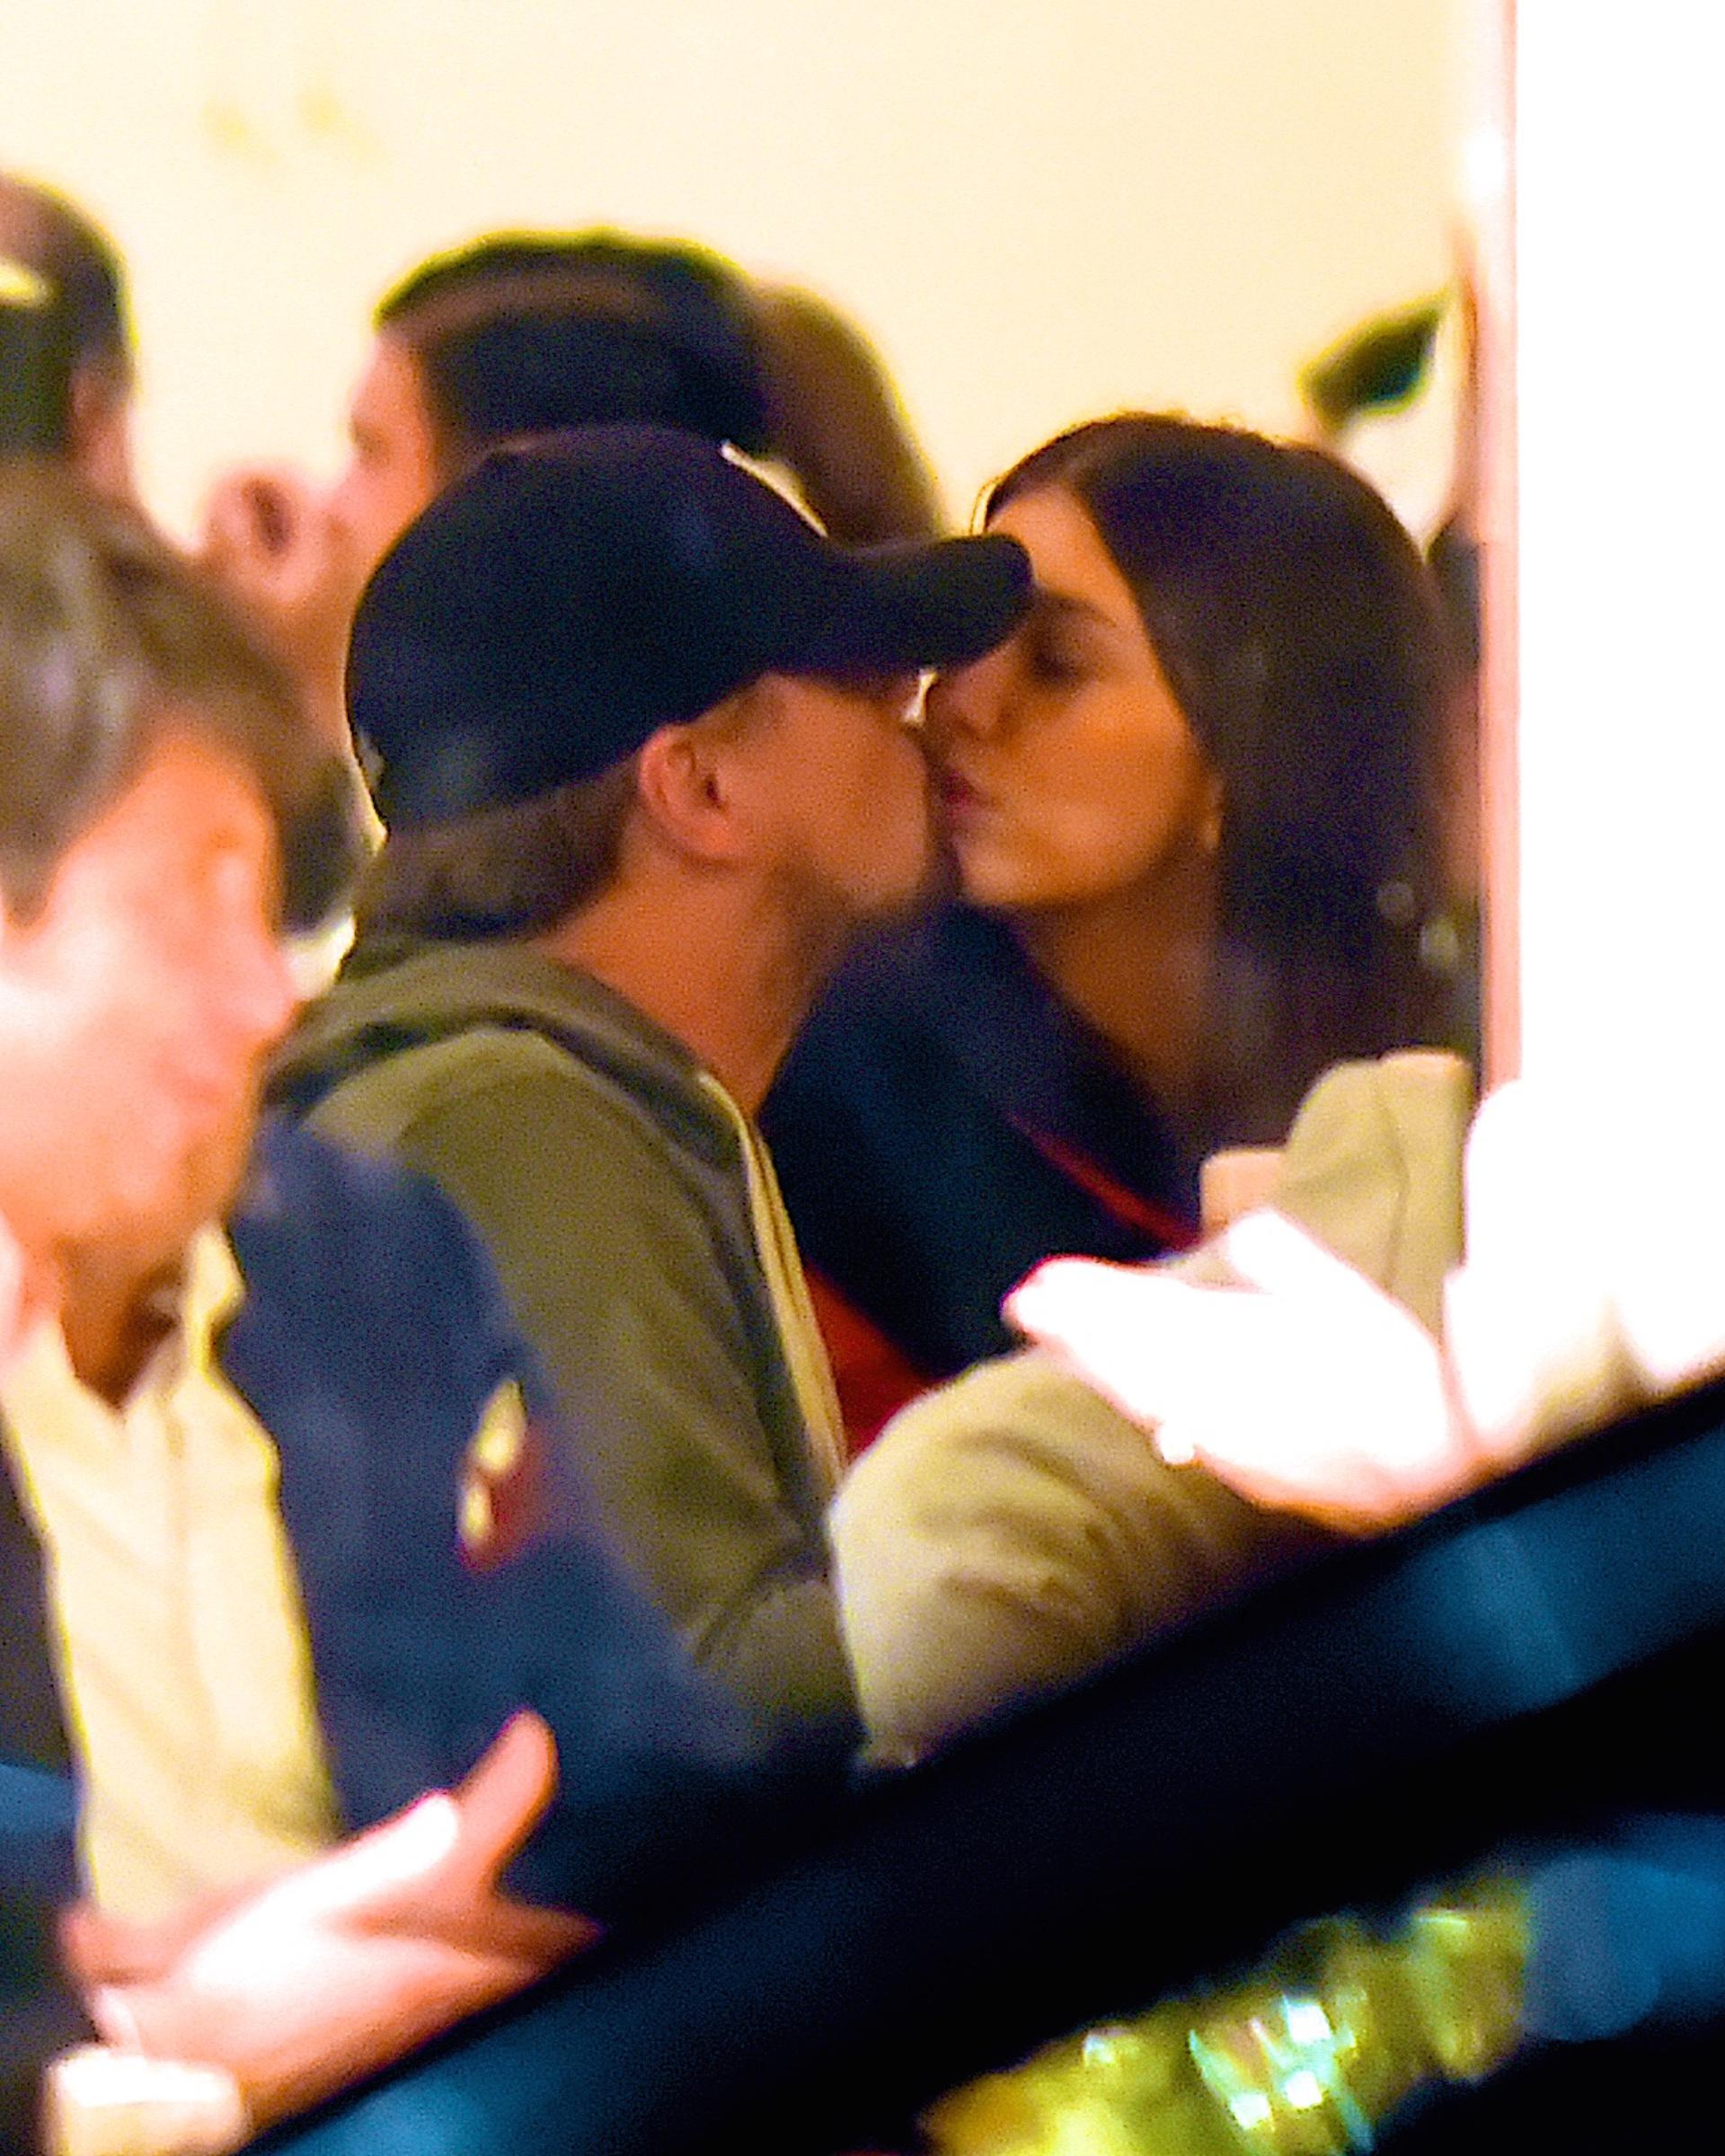 Leonardo DiCarprio and Camila Morrone shared a rare moment of PDA while having dinner in New York City on Jan. 9, 2019.